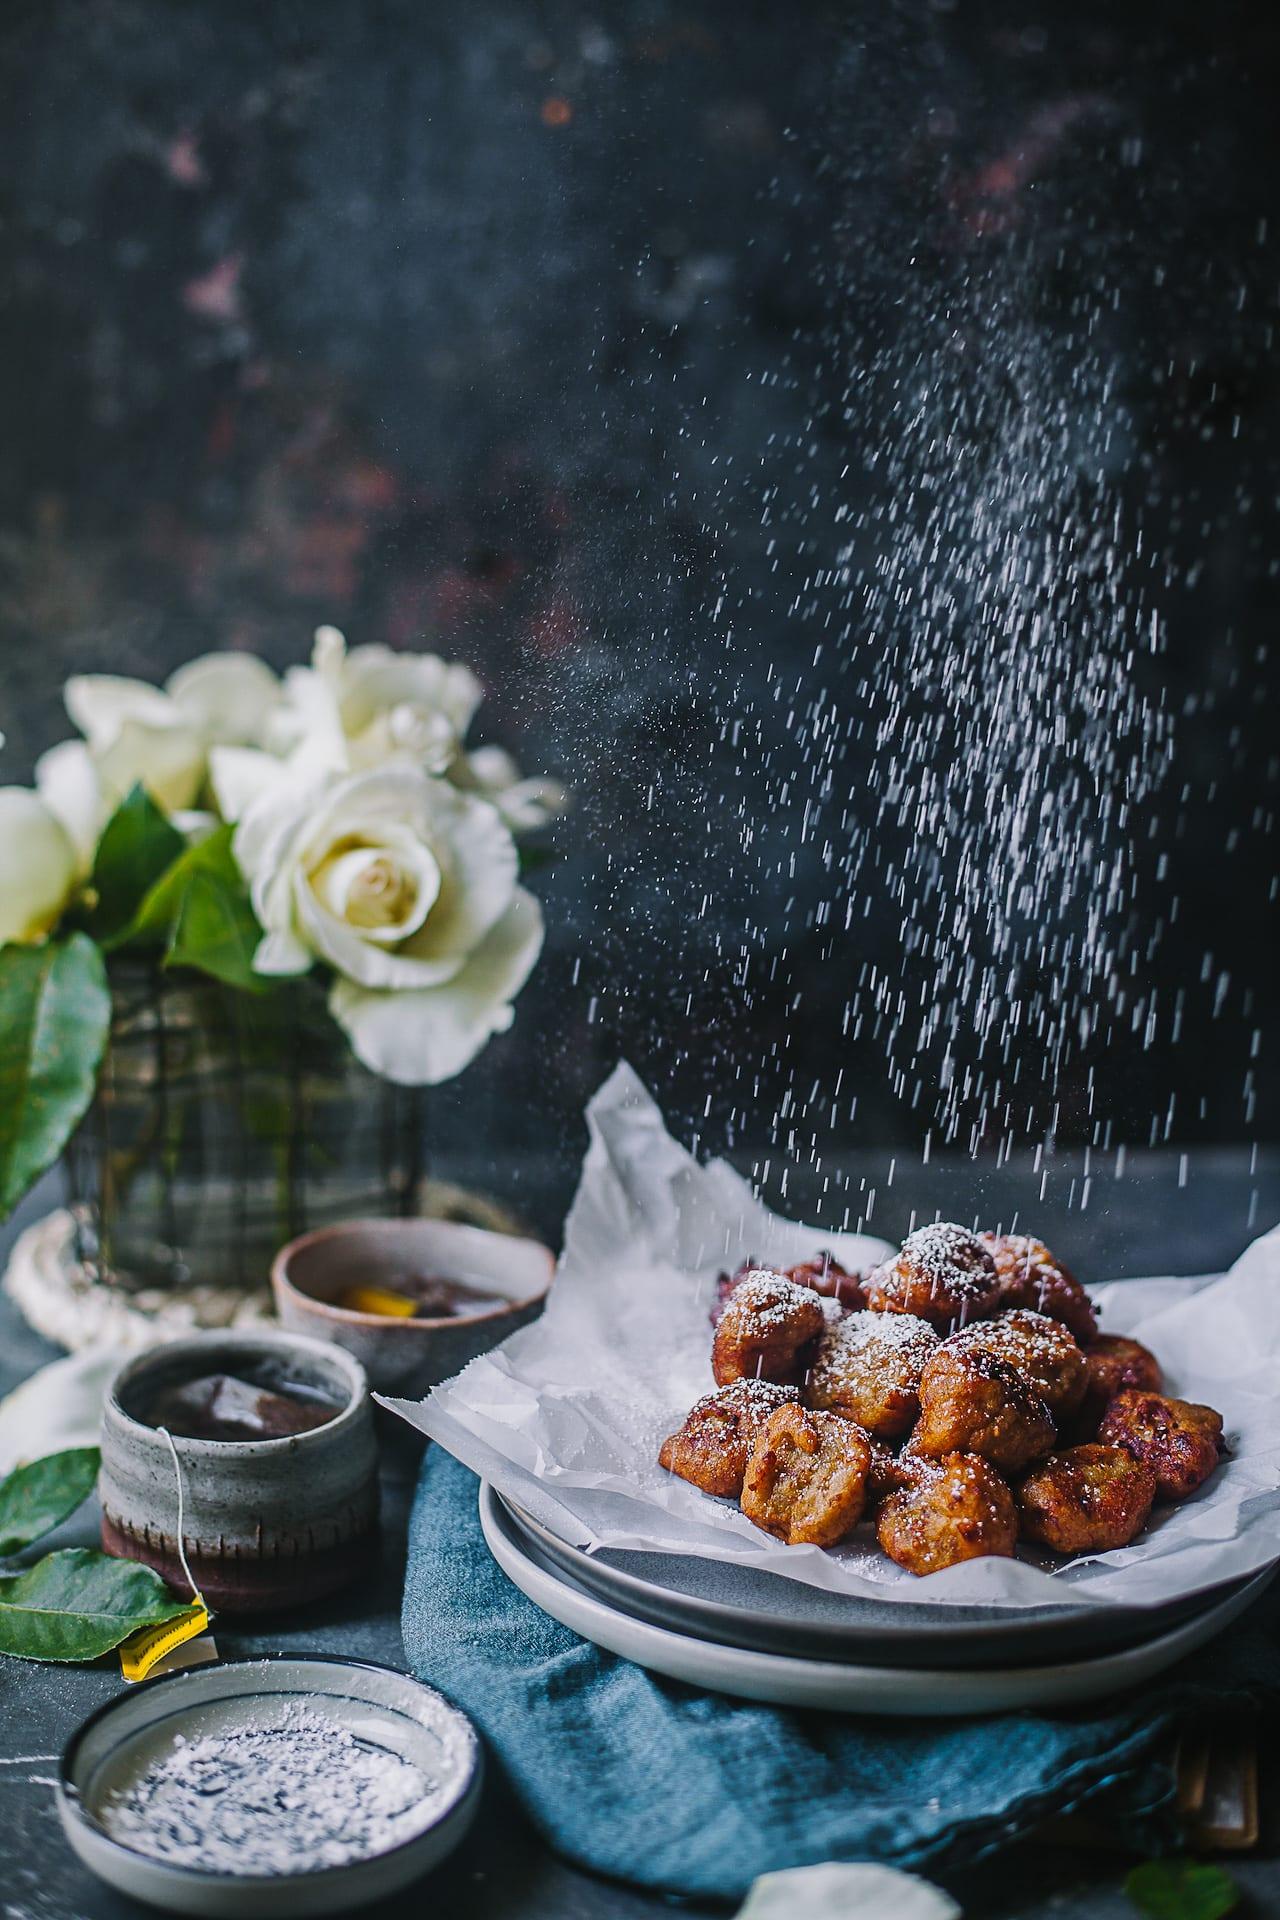 Kolar Boda (Bengali Style Banana Fritters) | Playful Cooking